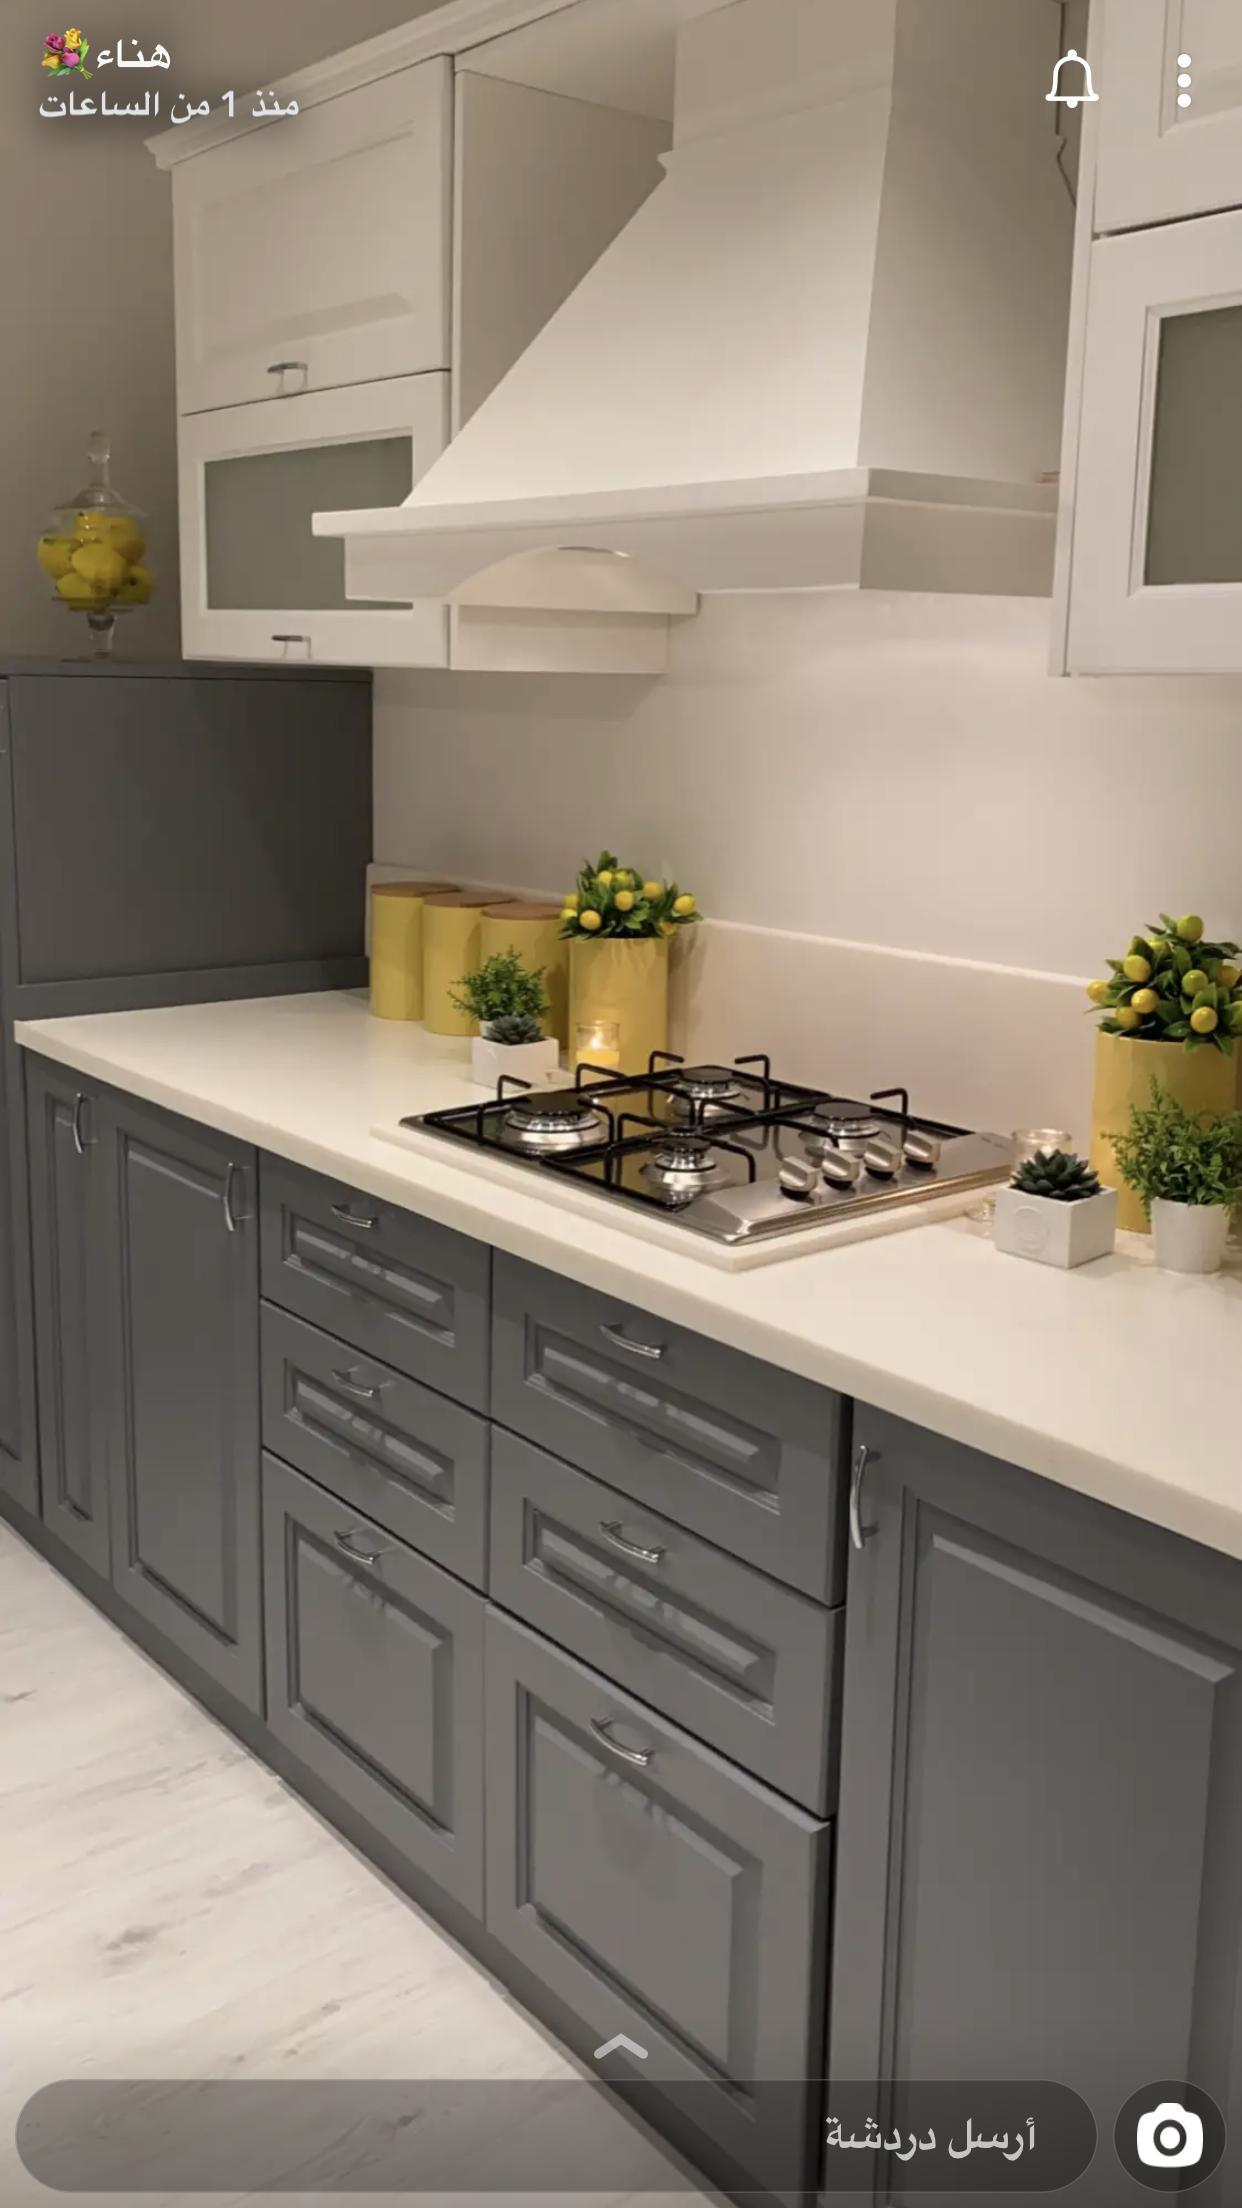 Pin By زينه On أفكار تصميم مدرسيه مطبخ اثاث Kitchen Remodel Small Modern Kitchen Design Kitchen Design